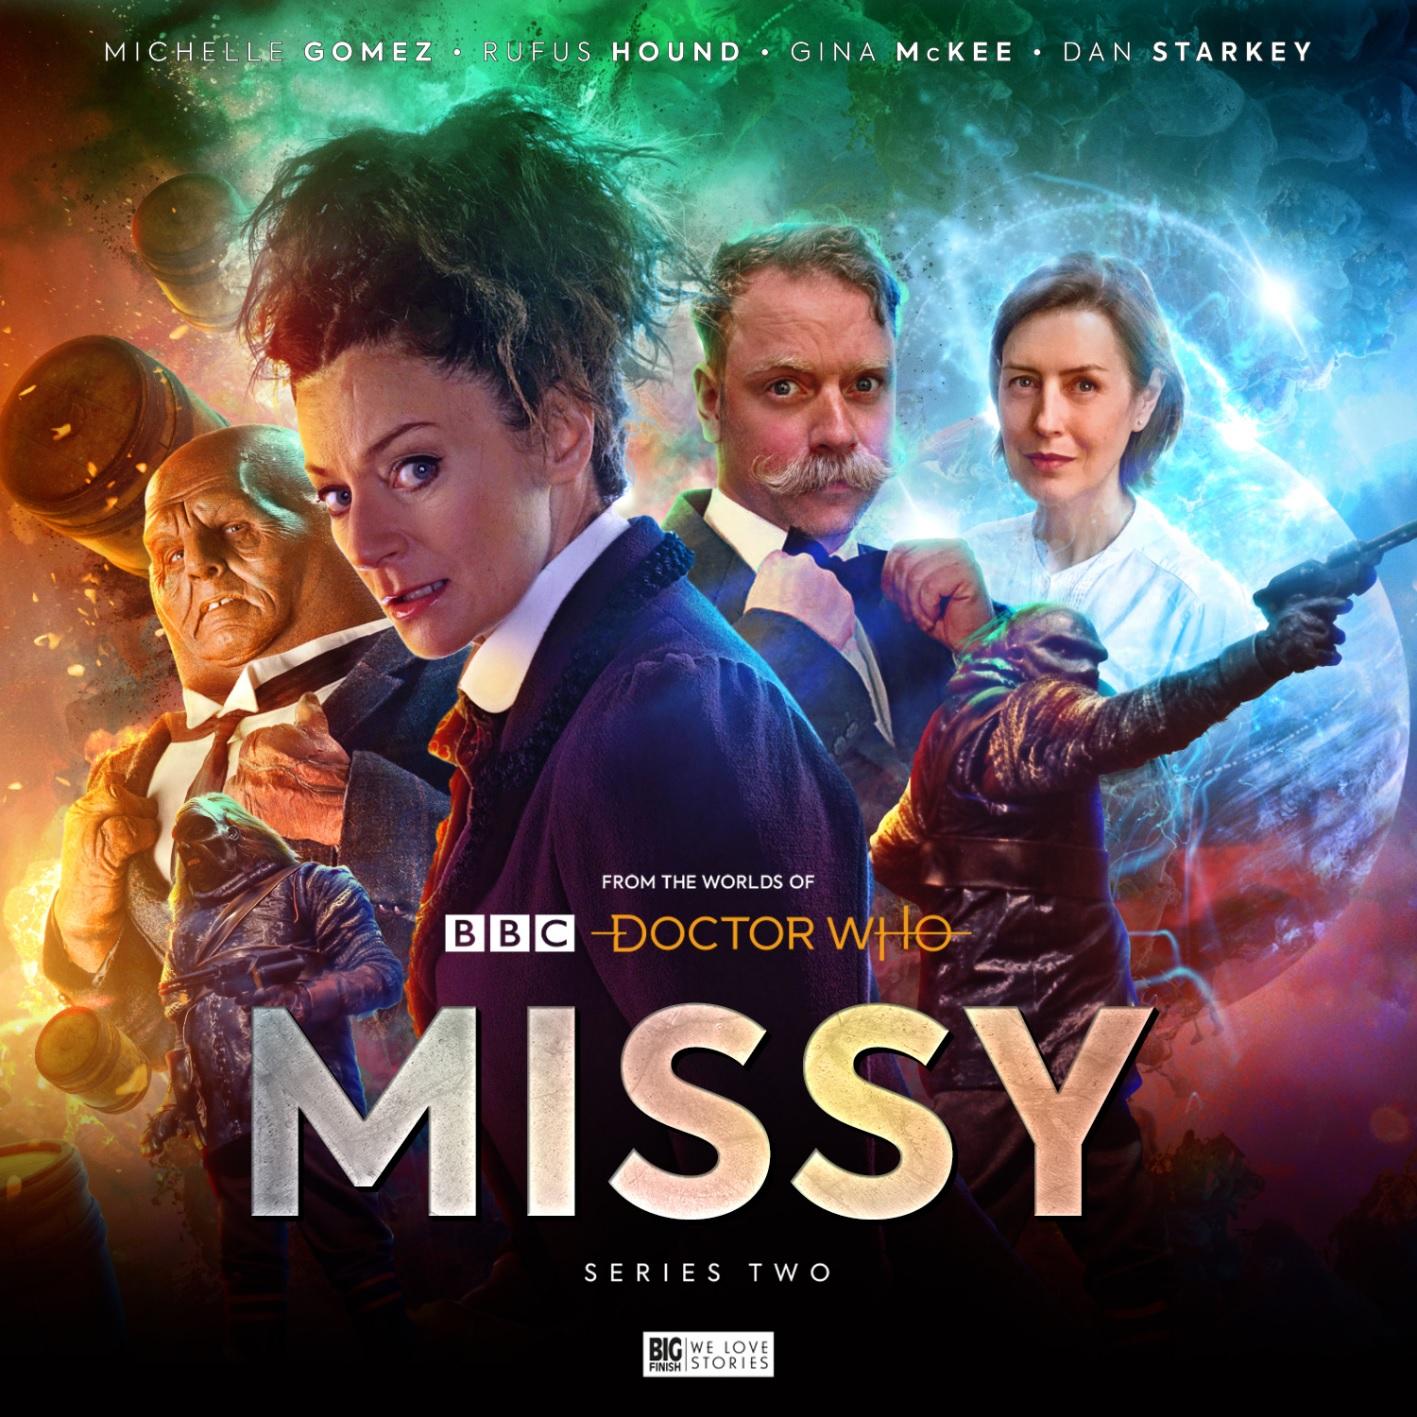 Reviewed: Big Finish's Missy Volume 2